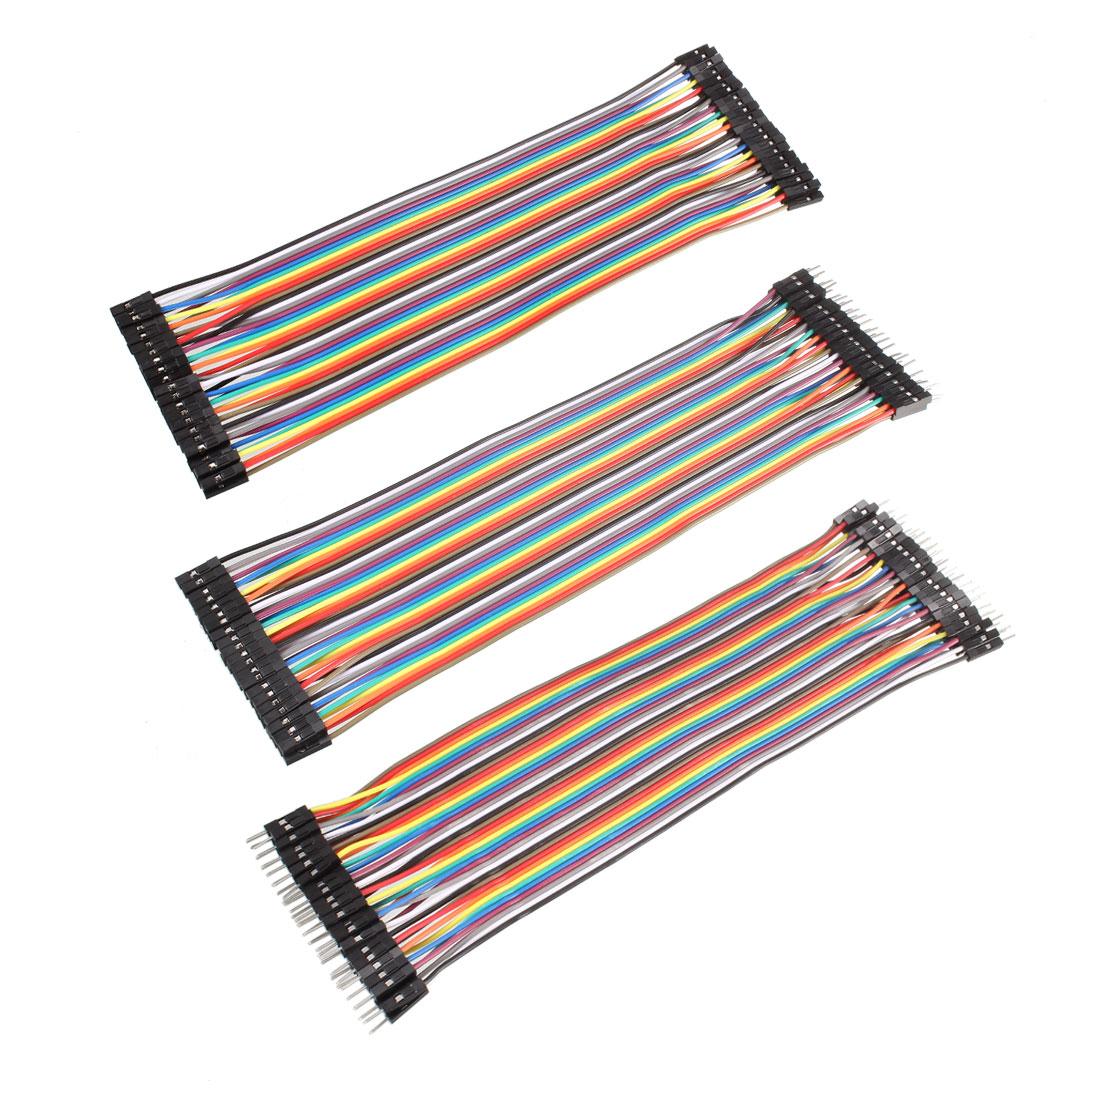 40P Breadboard Jumper Wire Ribbon Cable M/F F/F M/M 2.54mm Pitch 10cm Long 1Set